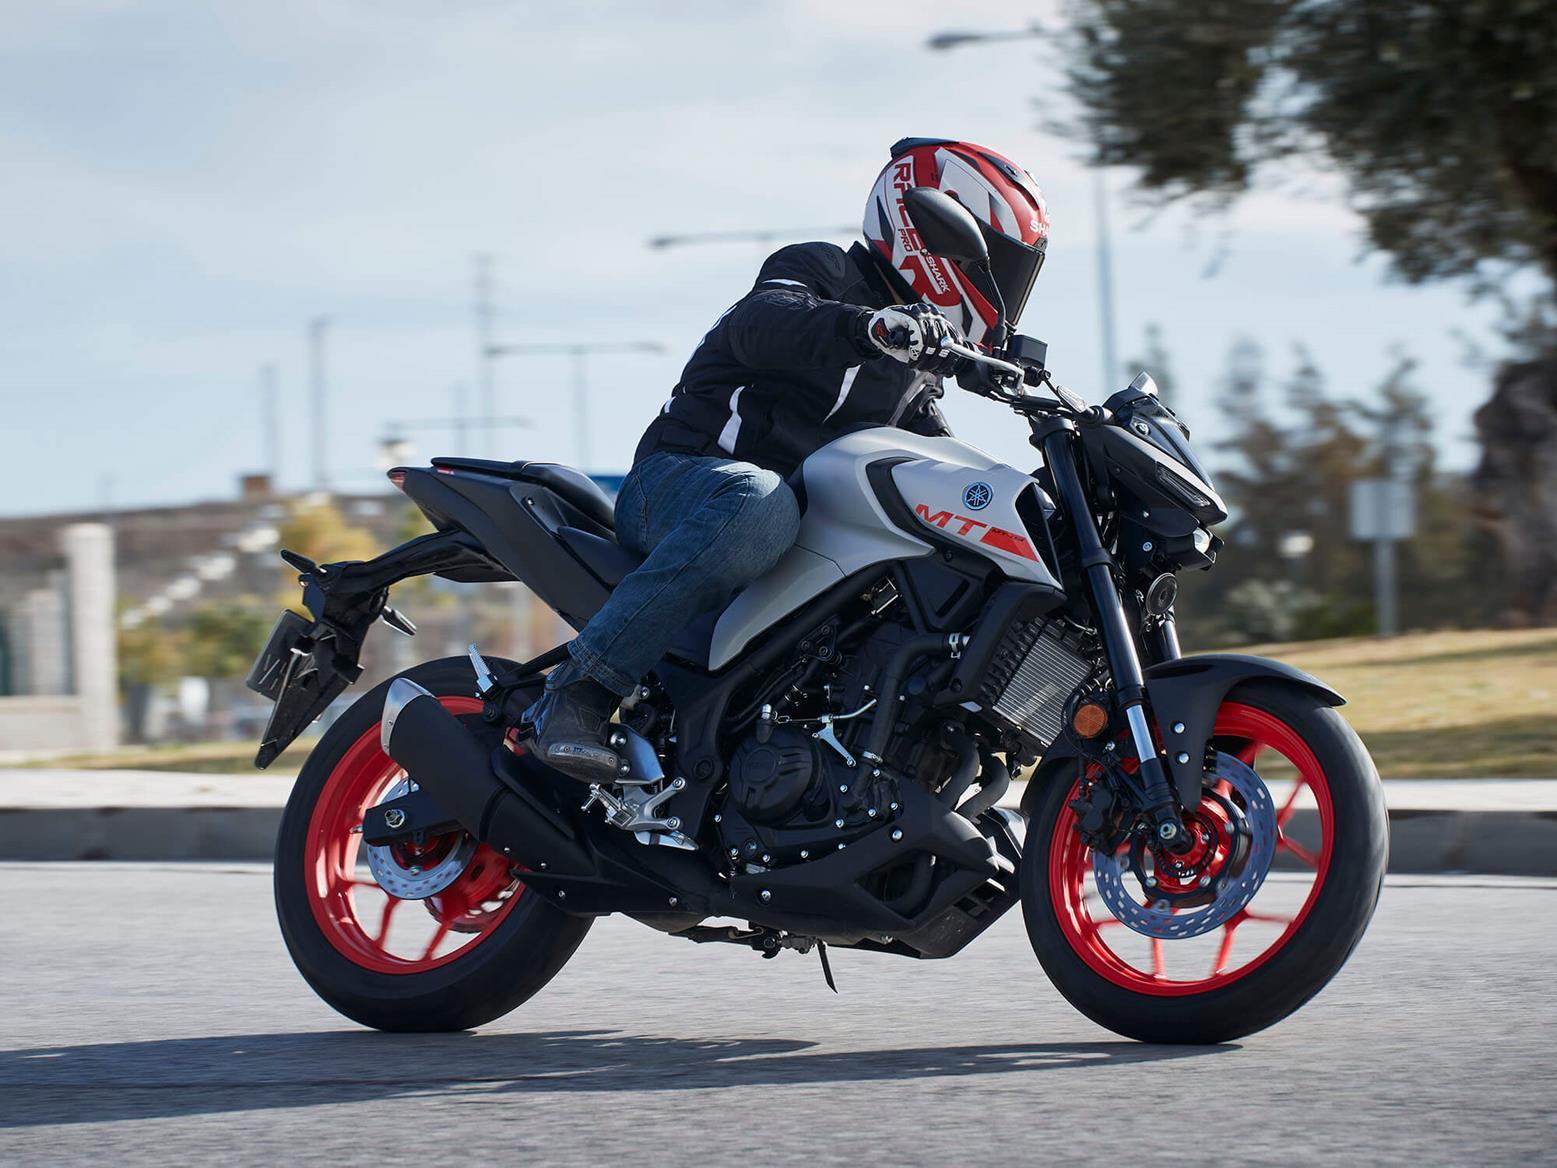 2020 Yamaha MT-03 on the road